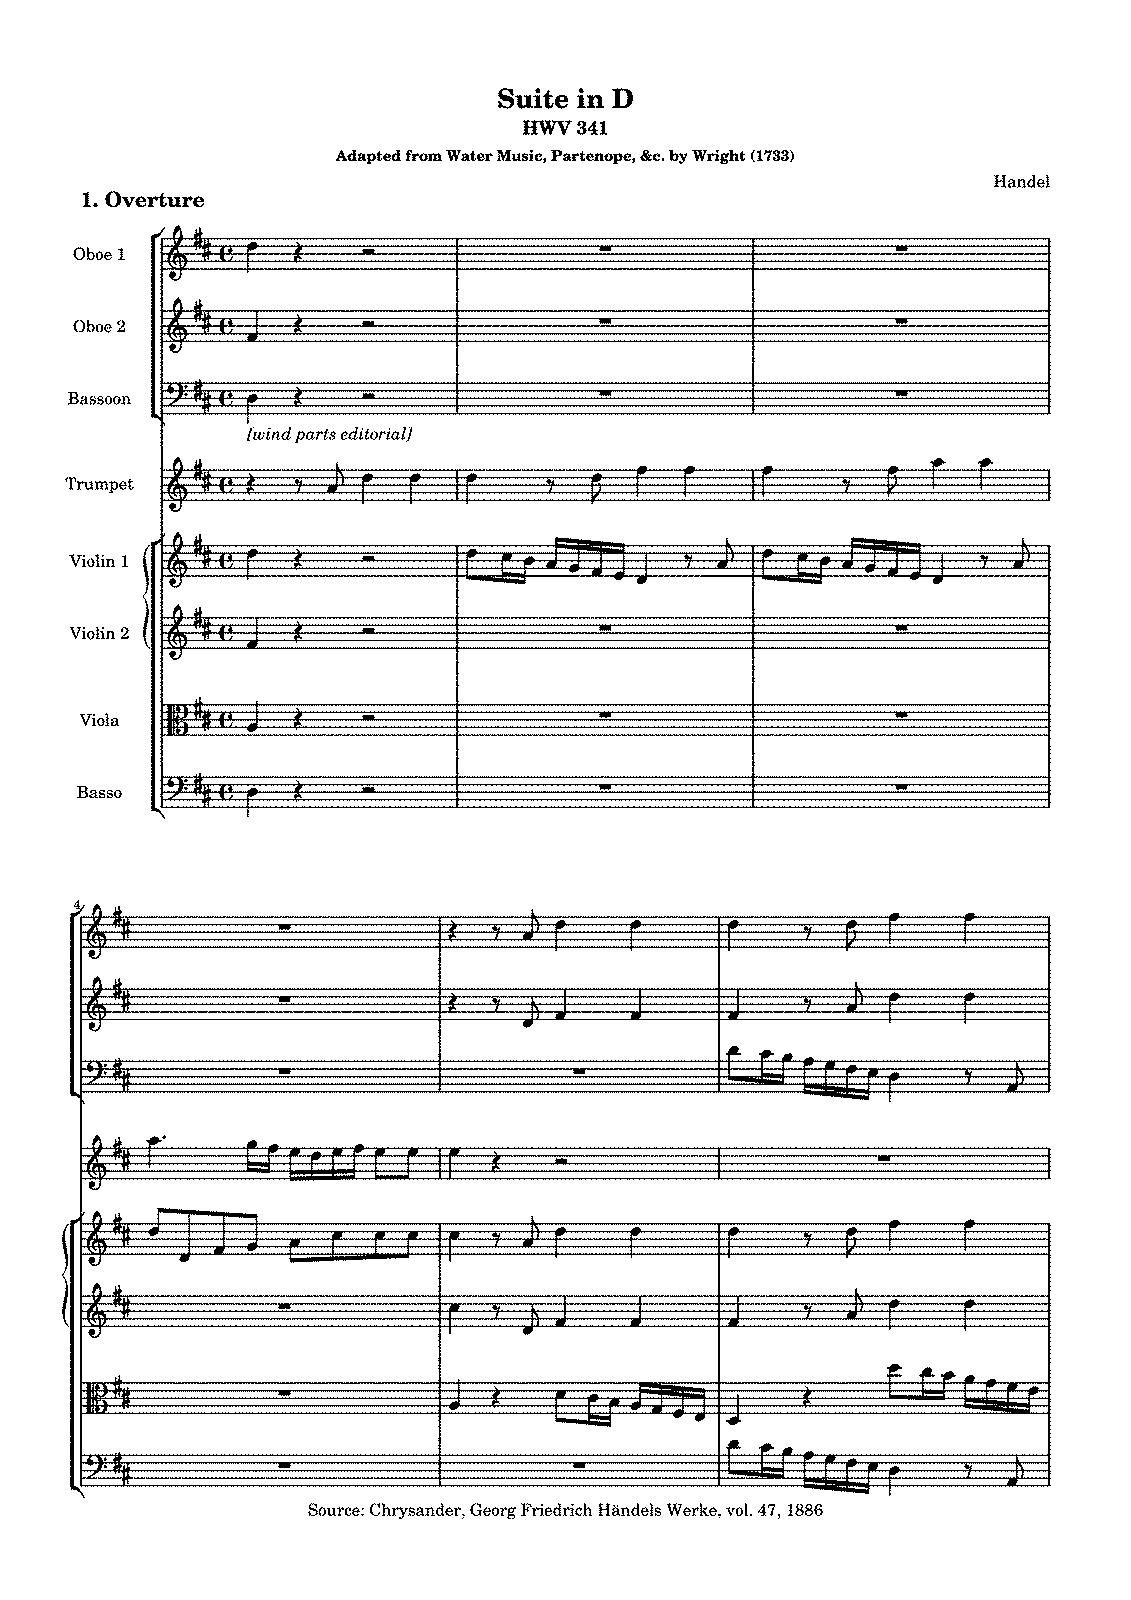 Suite in D major, HWV 341 (Handel, George Frideric) - IMSLP/Petrucci ...